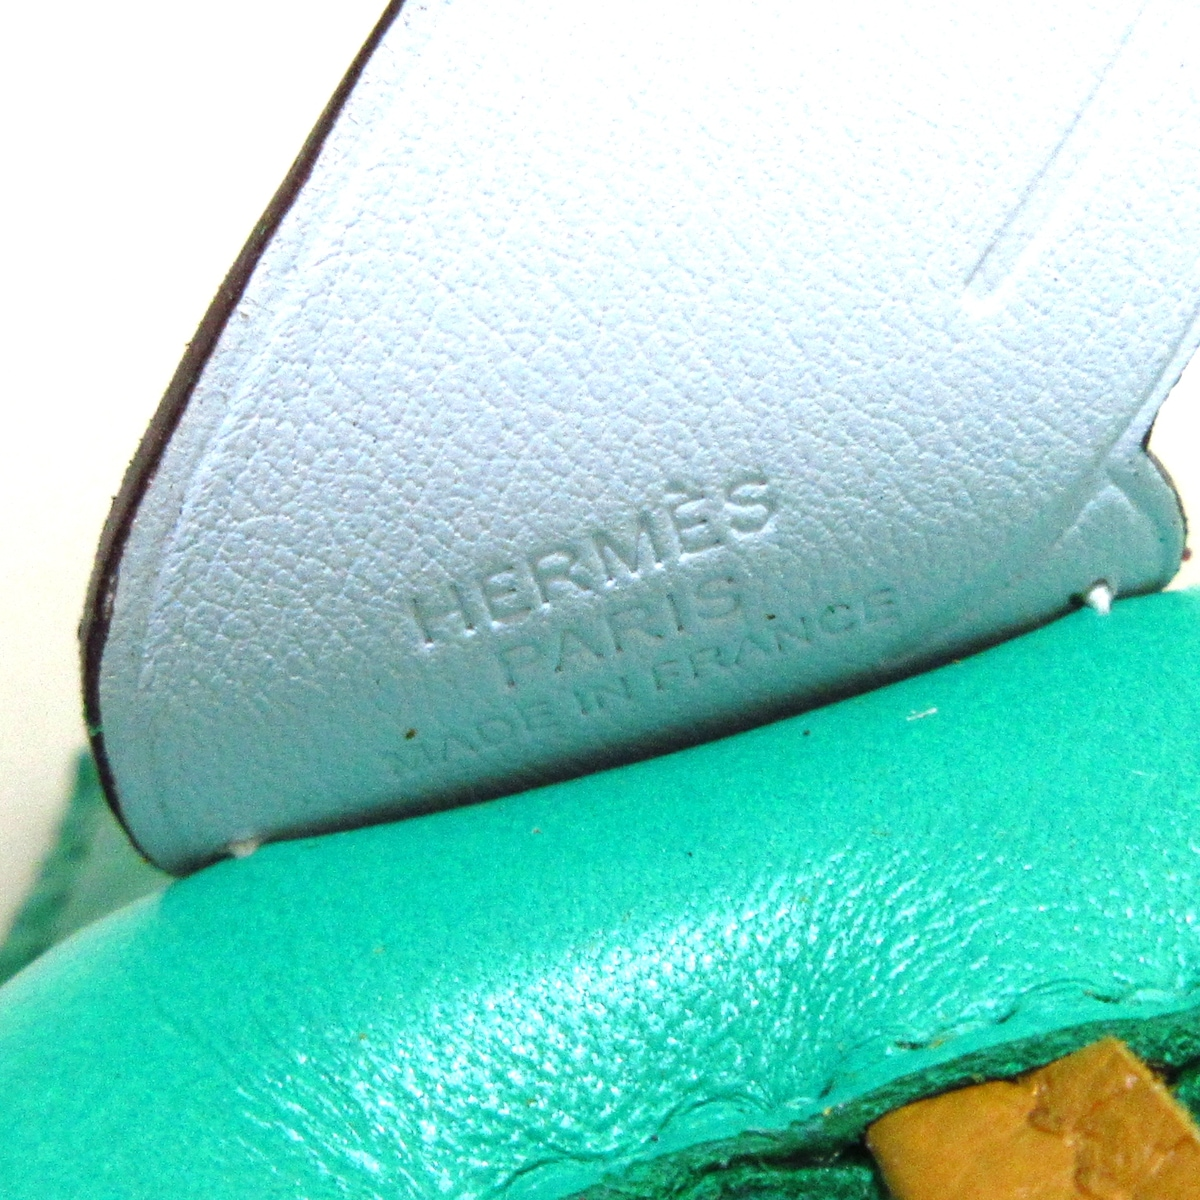 HERMES(エルメス)のロデオペガサスPM